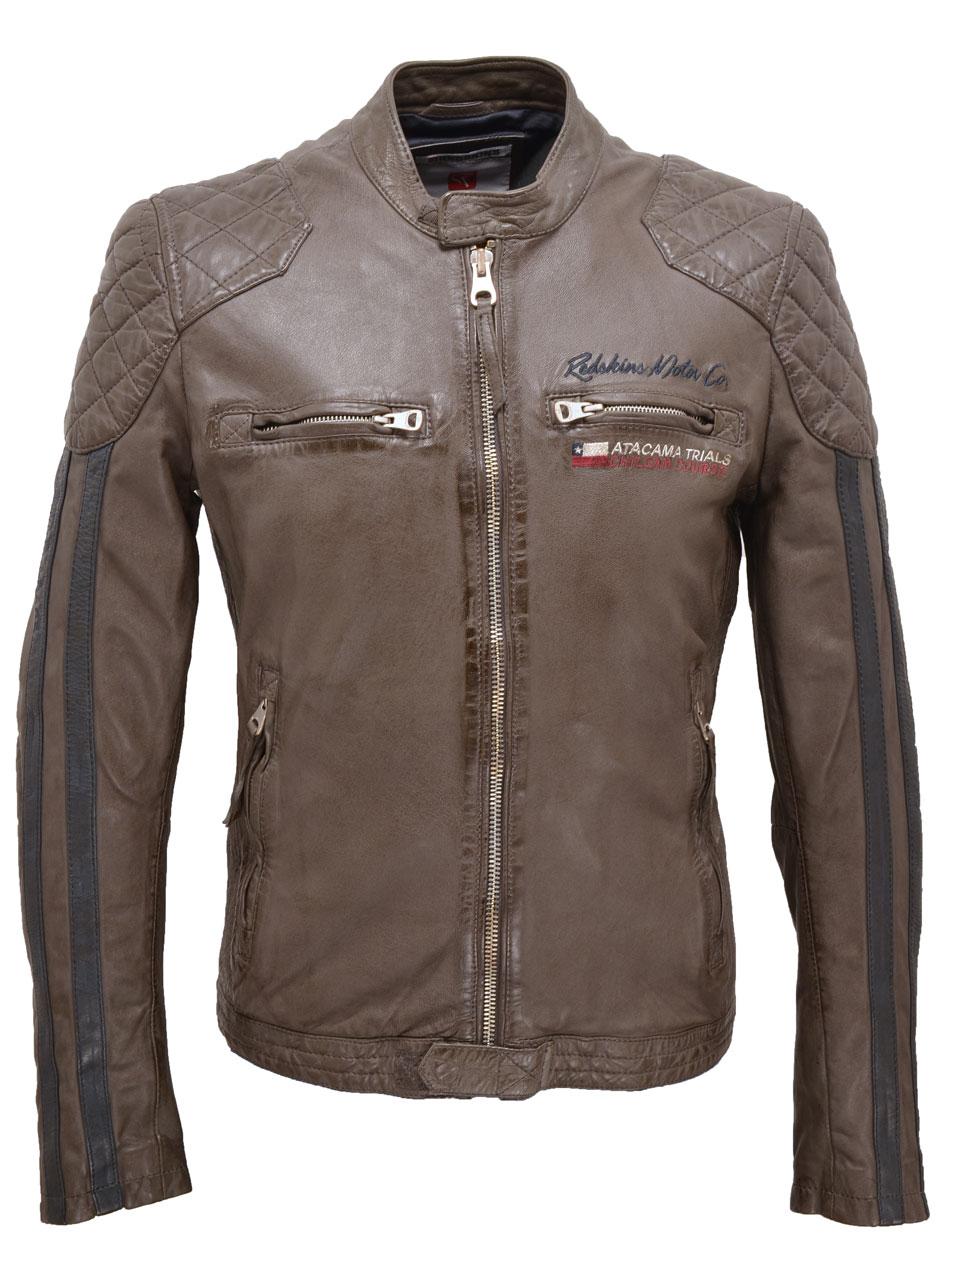 Vêtement en cuir Blousons cuir taupe